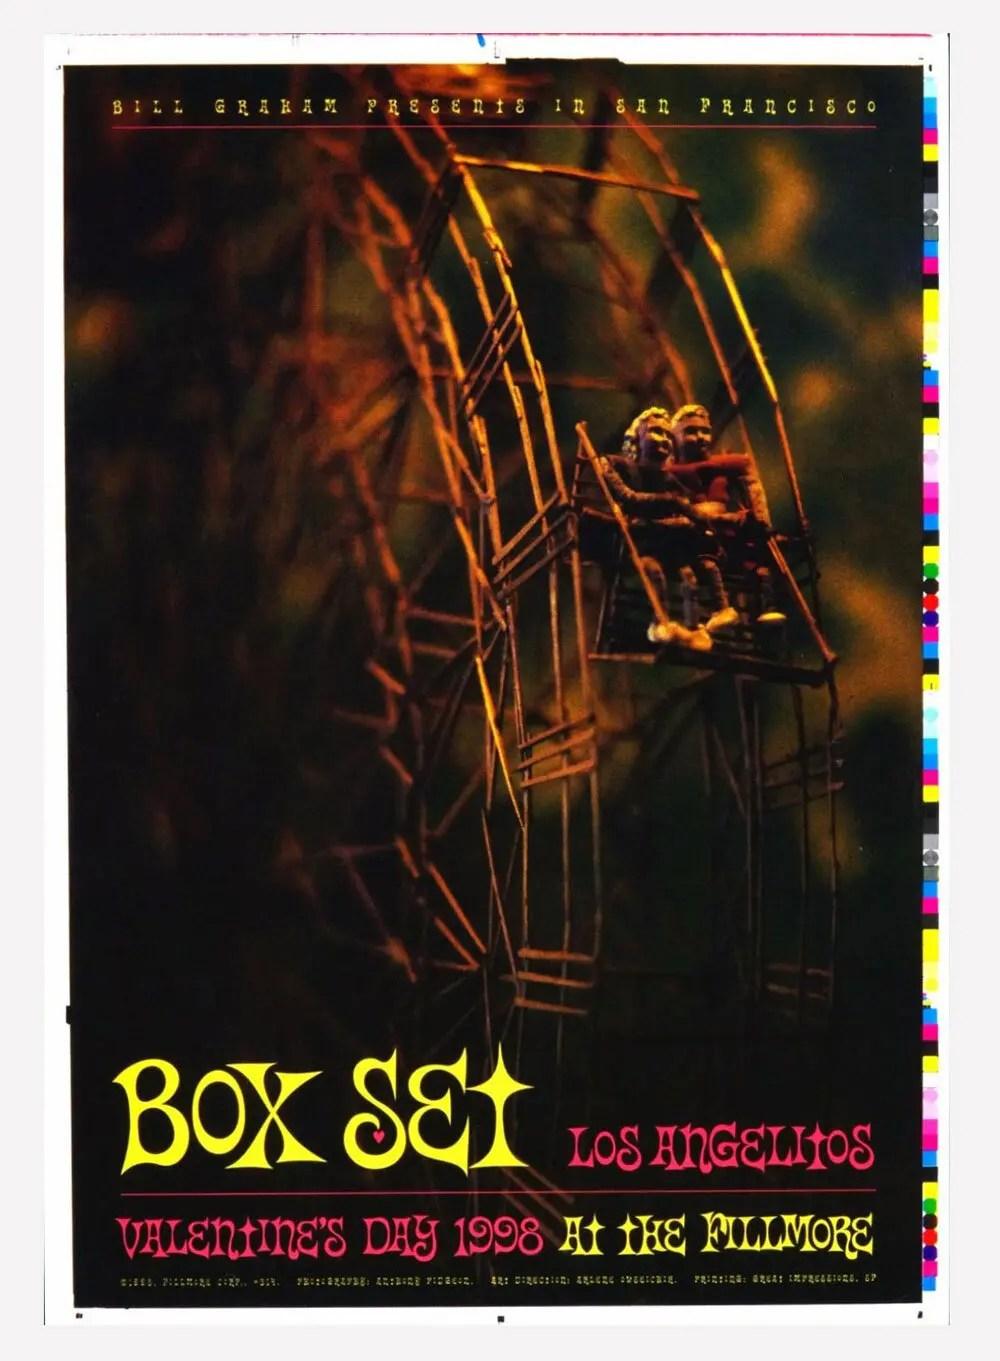 New Fillmore F314 Poster Proof Box Set Los Angelitos 1998 Feb 14